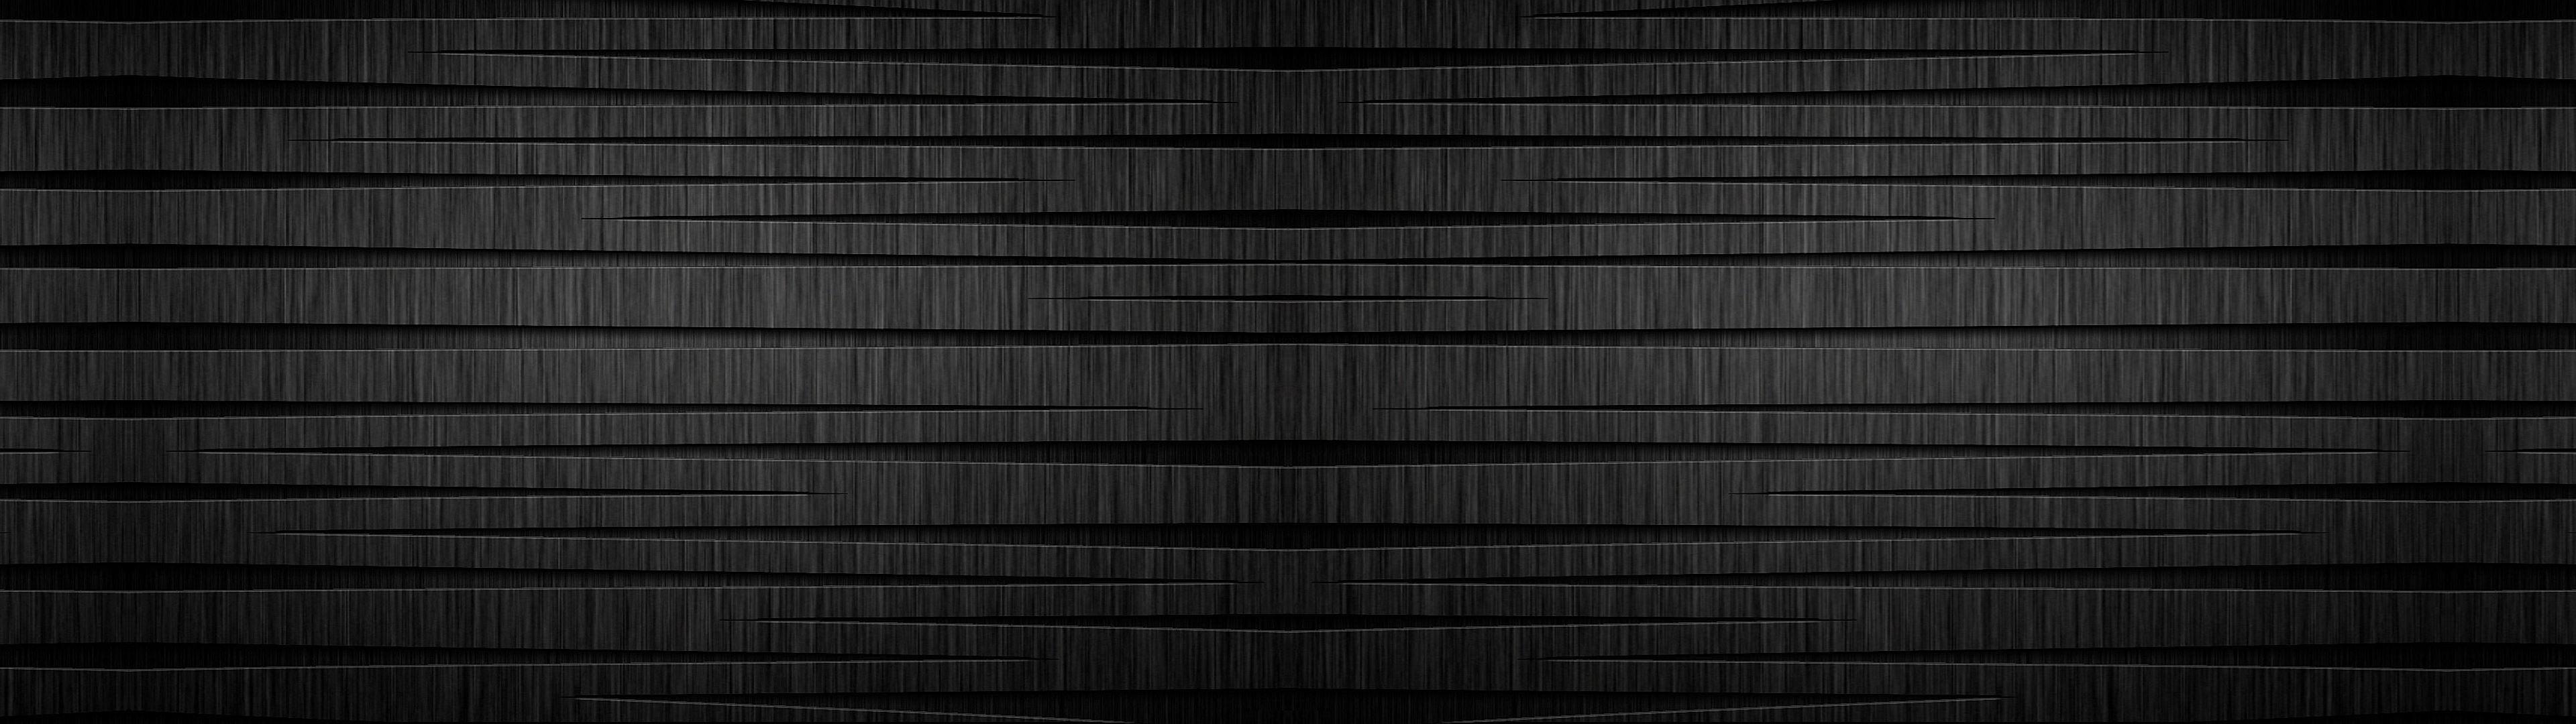 Black And Gray Wallpaper Multiple Display Abstract Lines Digital Art 4k Wallpaper Hdwallpaper Des Grey Wallpaper Black And Grey Wallpaper Black Wallpaper